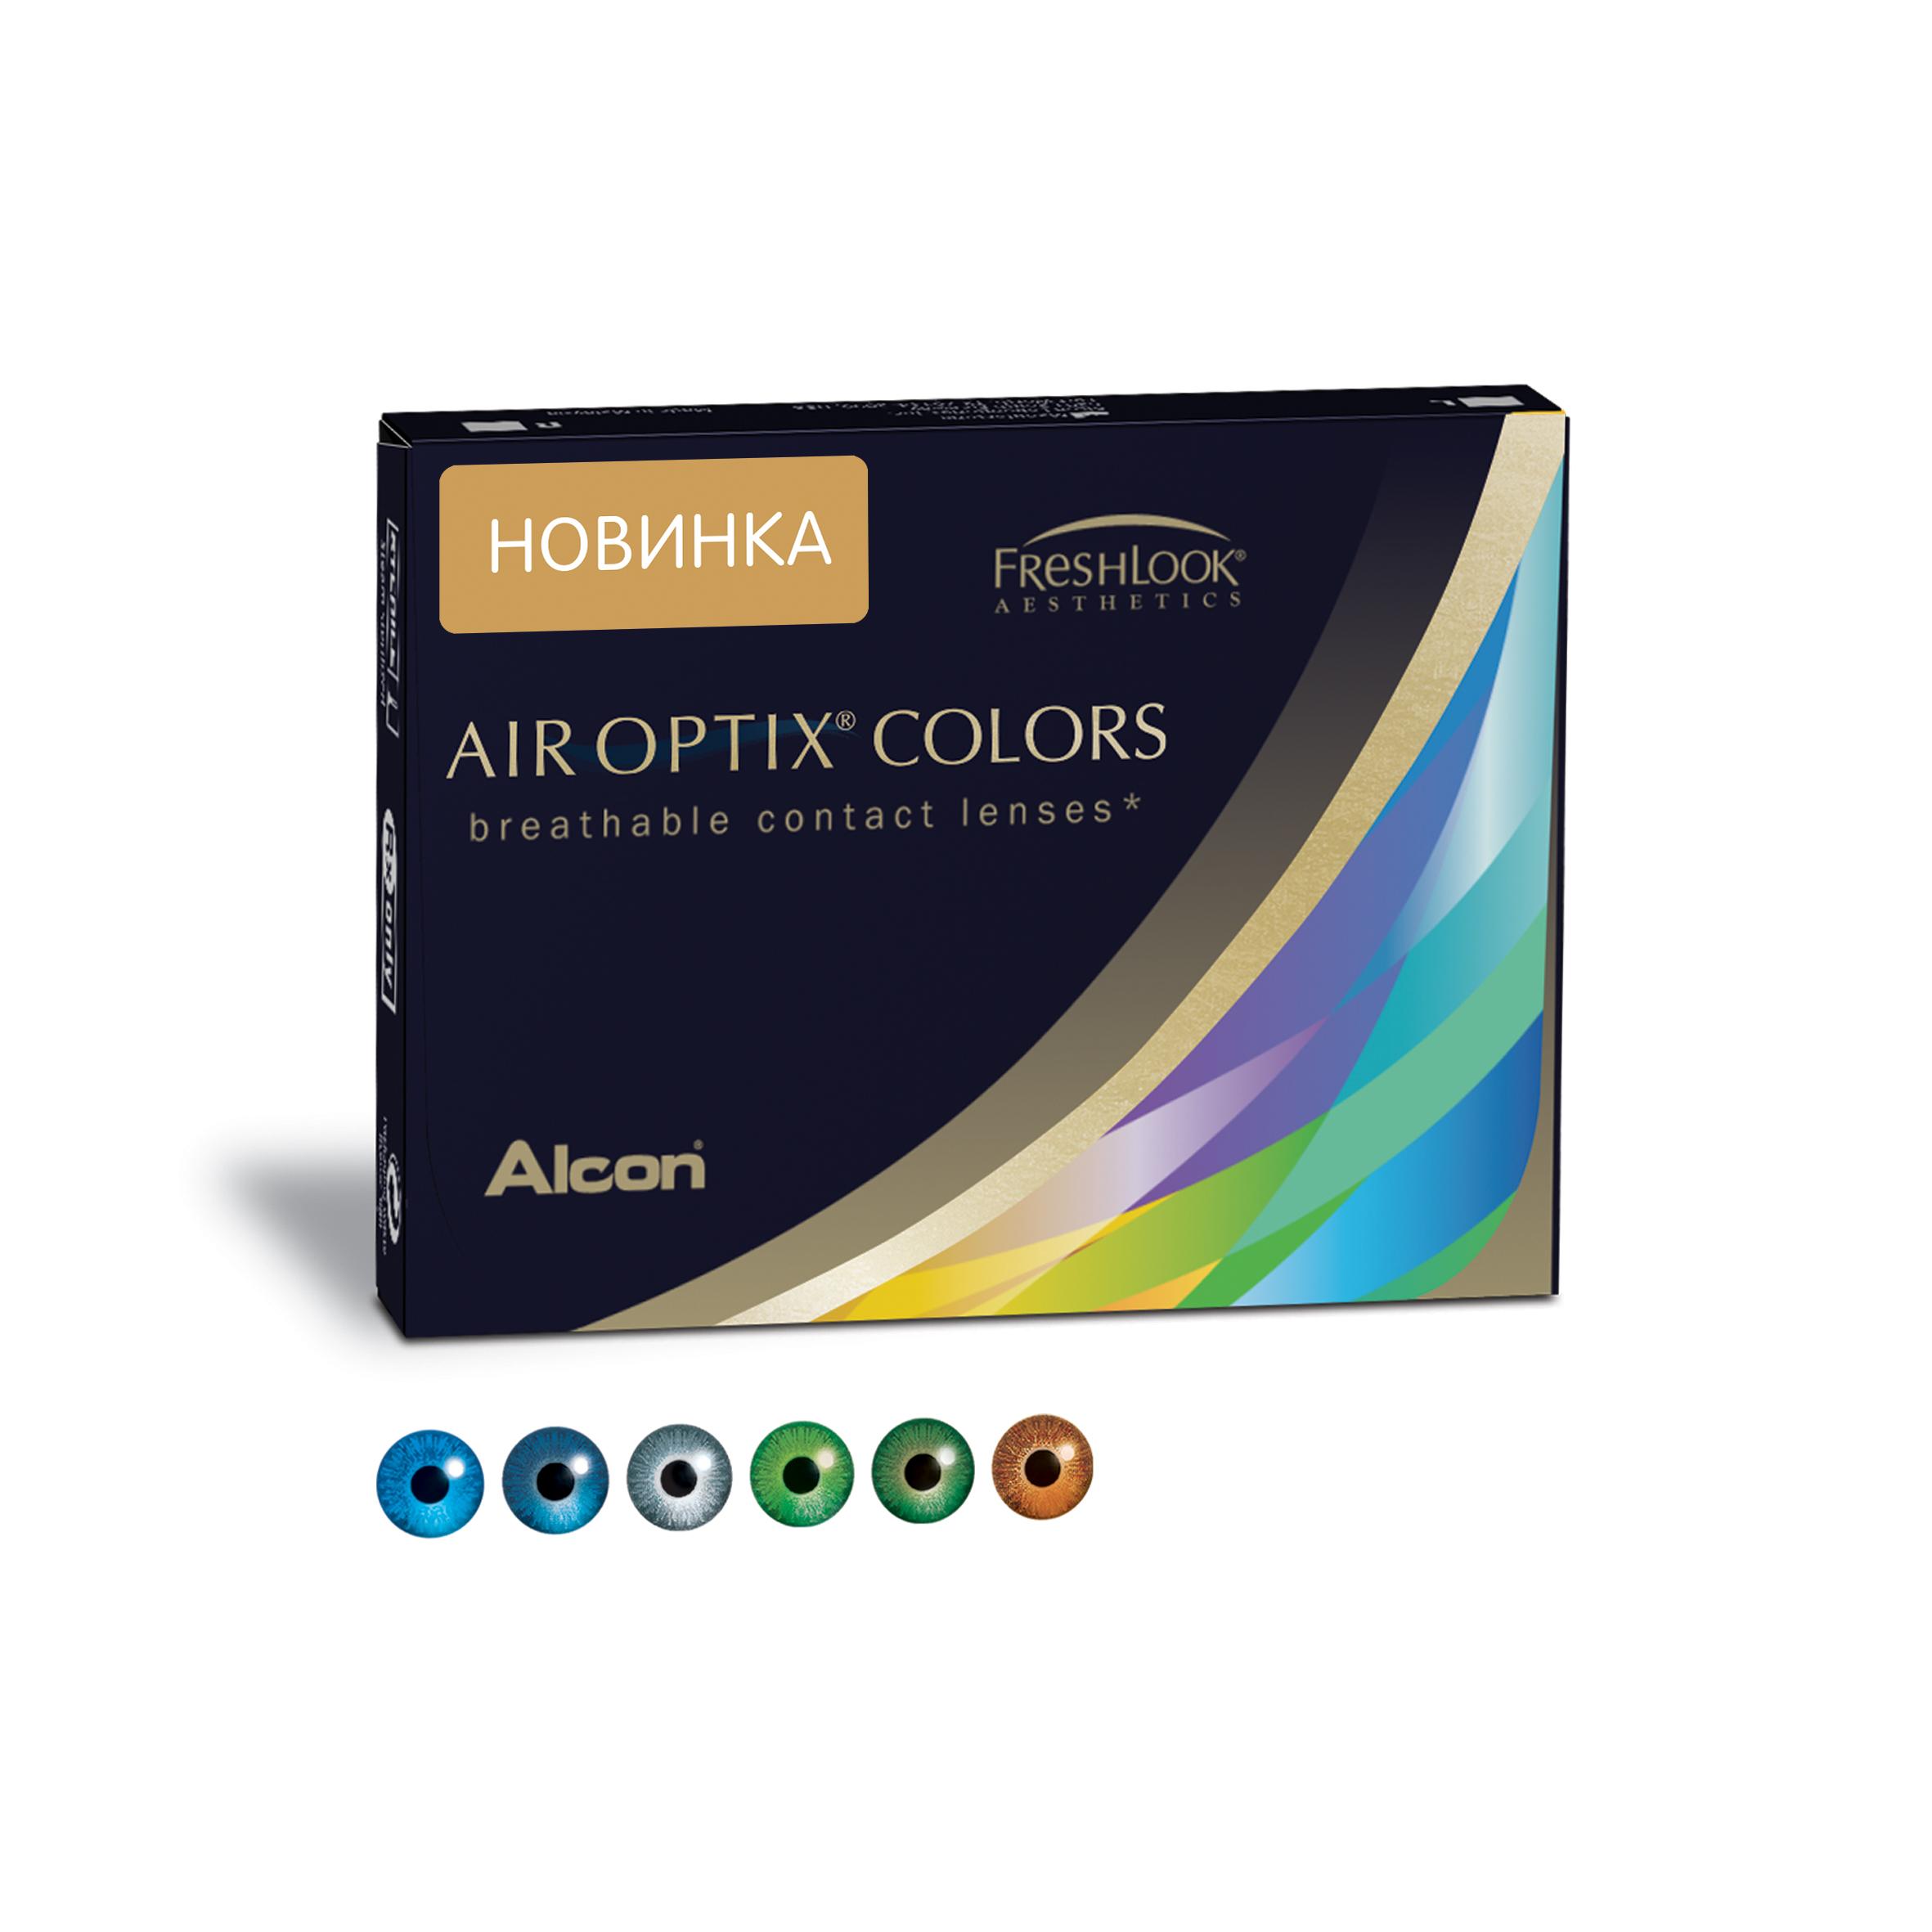 Аlcon контактные линзы Air Optix Colors 2 шт -2.50 Green31746180Мягкие контактные линзы